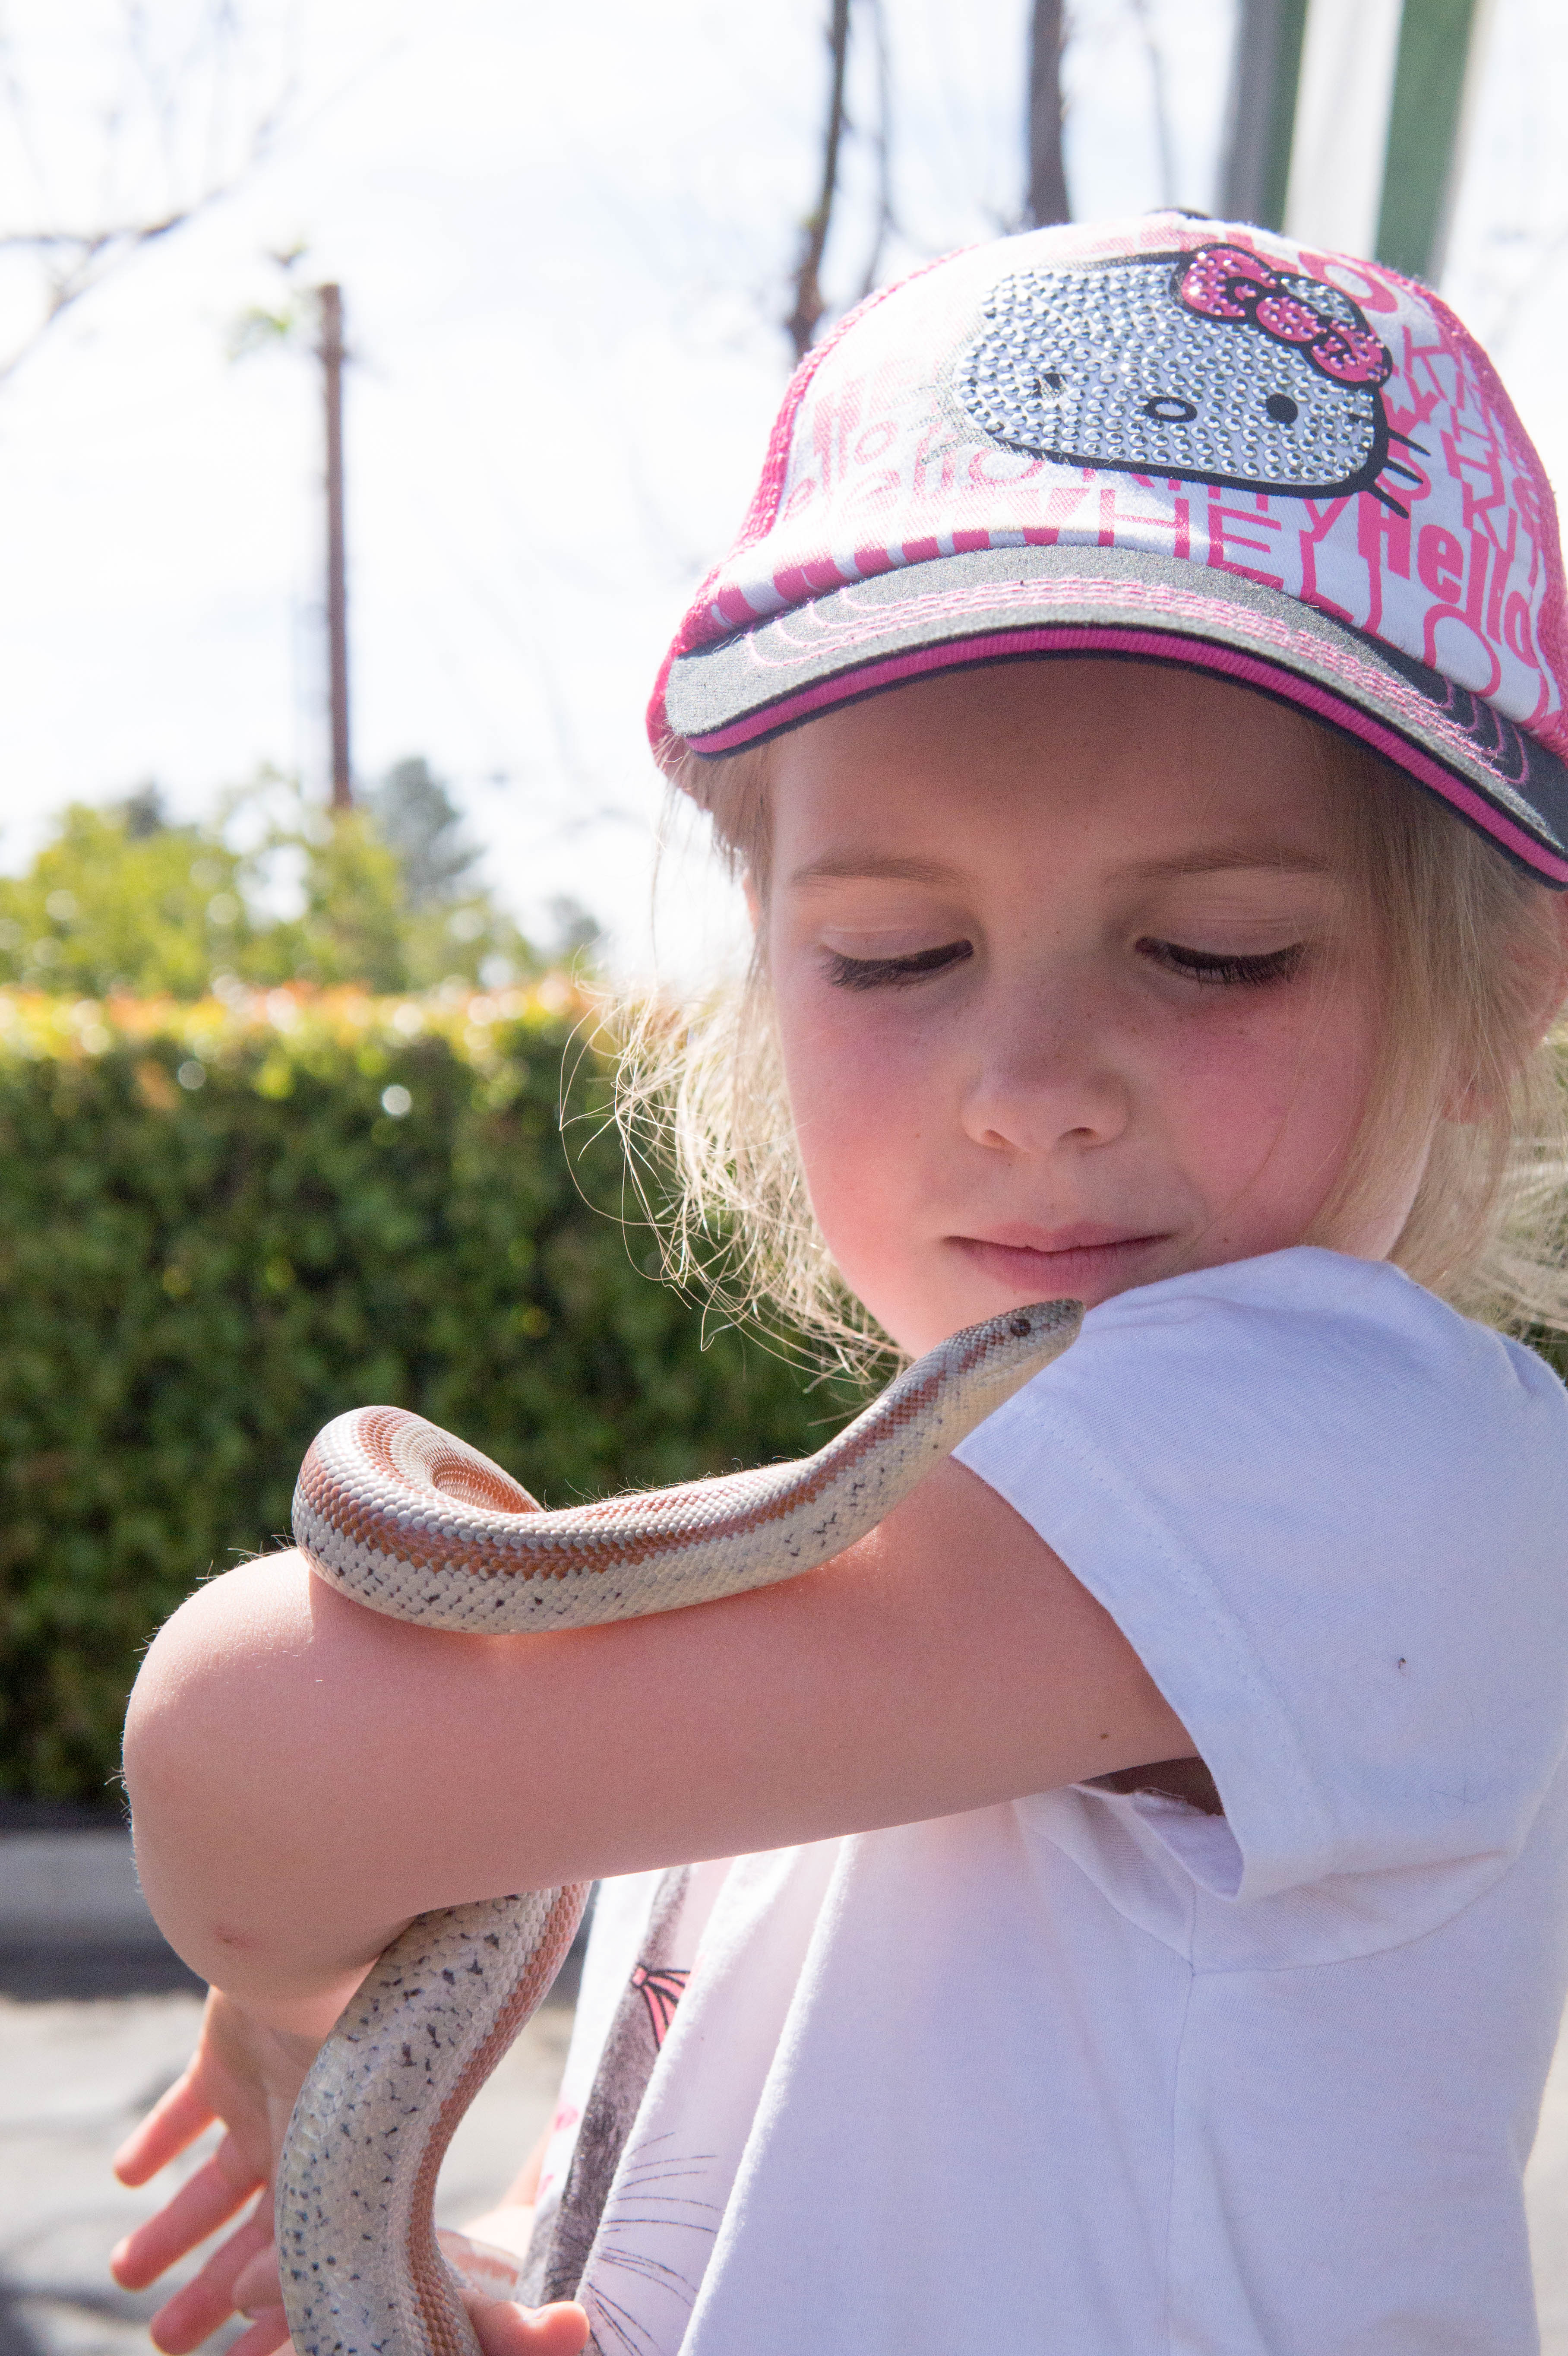 Fun w/ Snakes 2